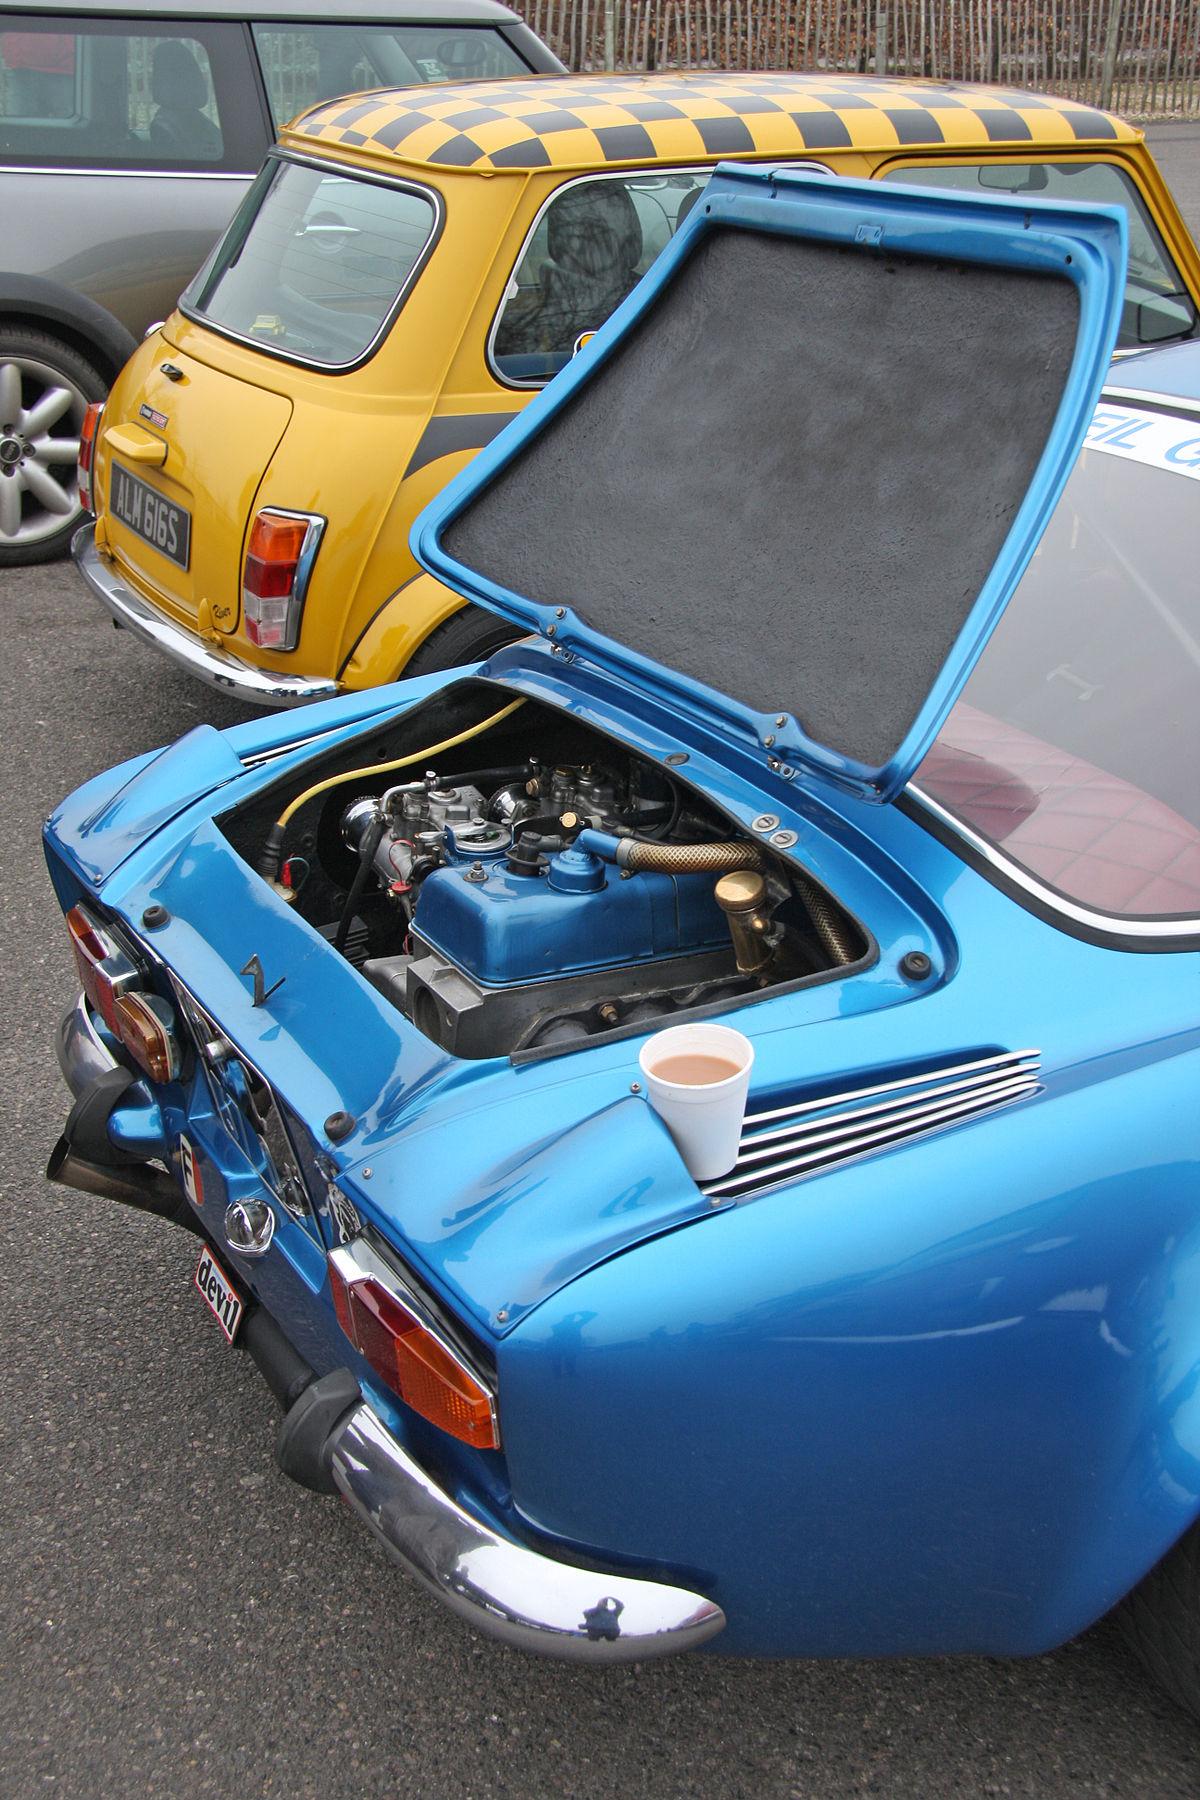 Px Alpine Renault A Berlinette Flickr Exfordy on 4 Stroke Internal Combustion Engine